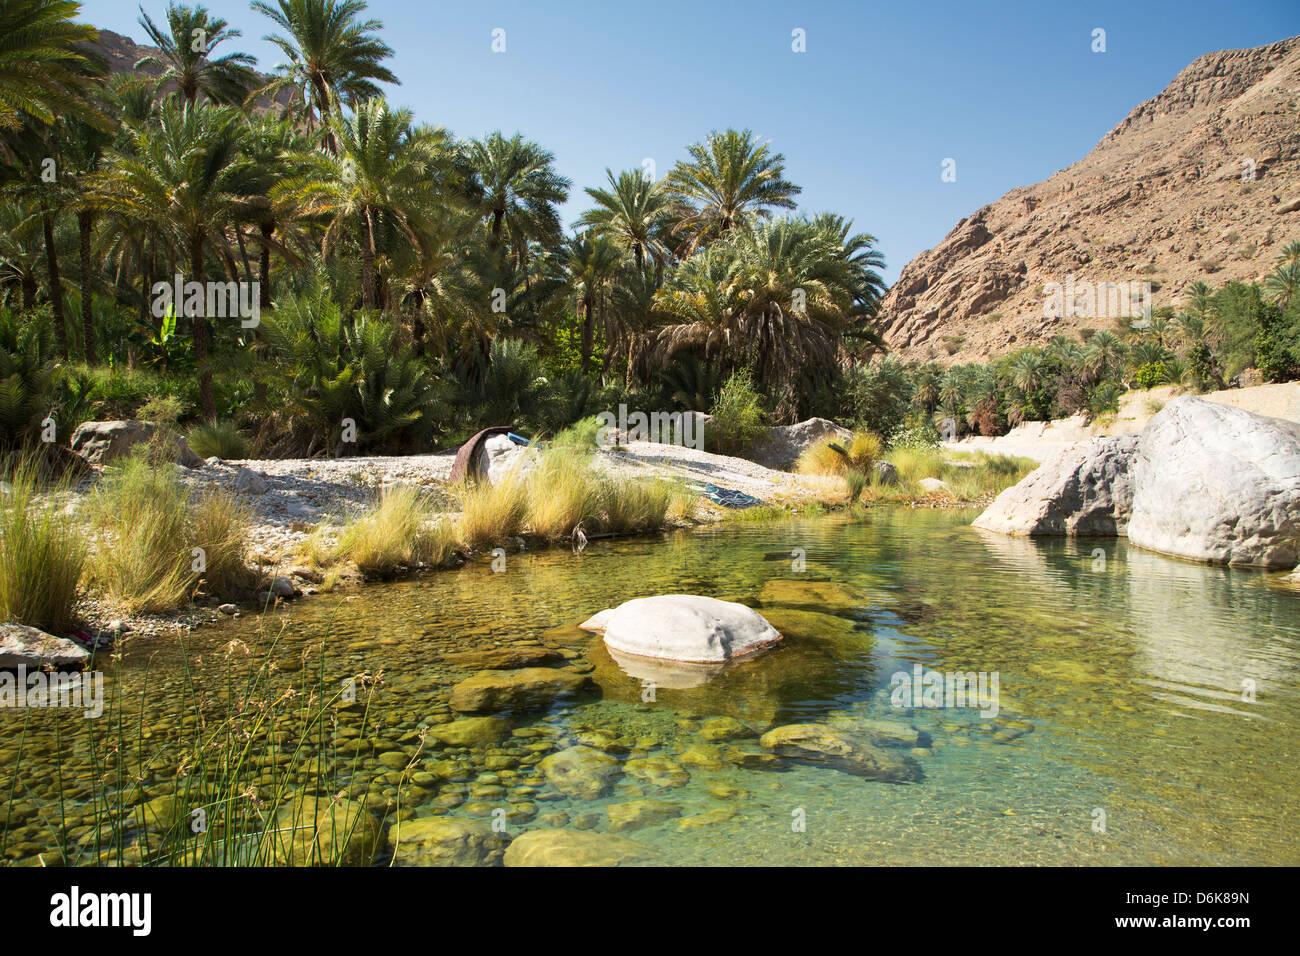 Wadi Bani Khalid, Oman, Middle East Photo Stock